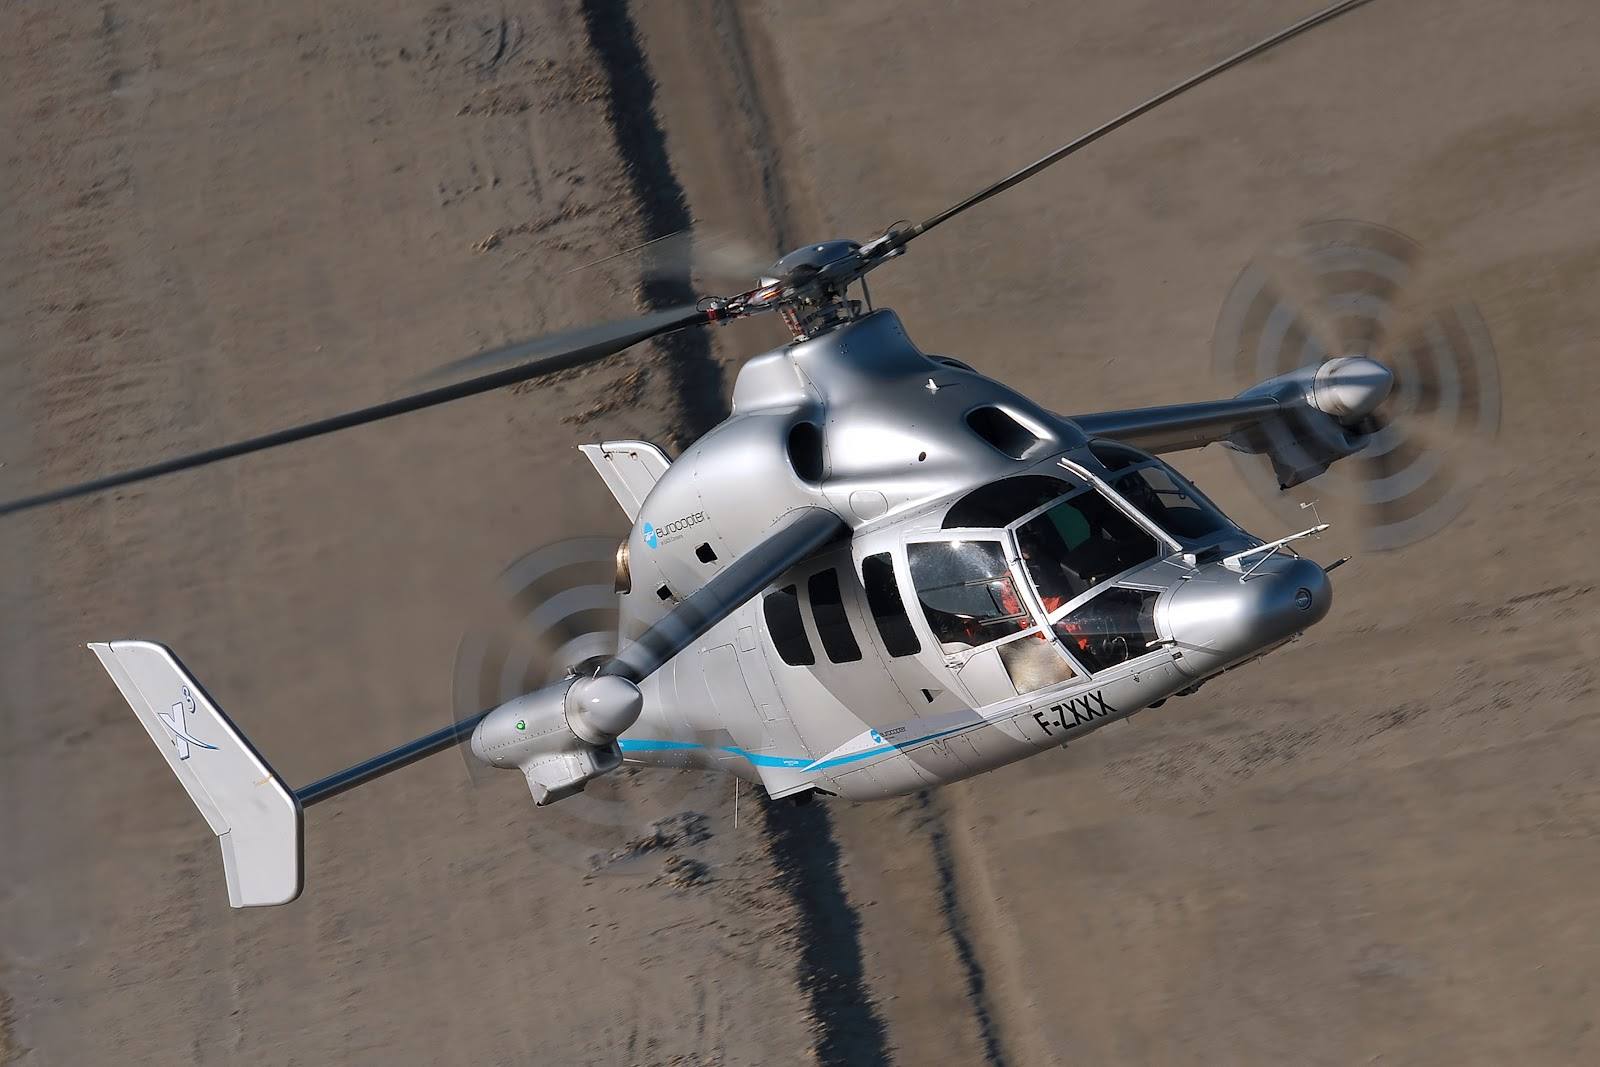 http://3.bp.blogspot.com/-4cHYBzNGpAQ/T84Aoj5zTUI/AAAAAAAAI3Y/uUvsB9kJOwU/s1600/eurocopter_x3.jpg